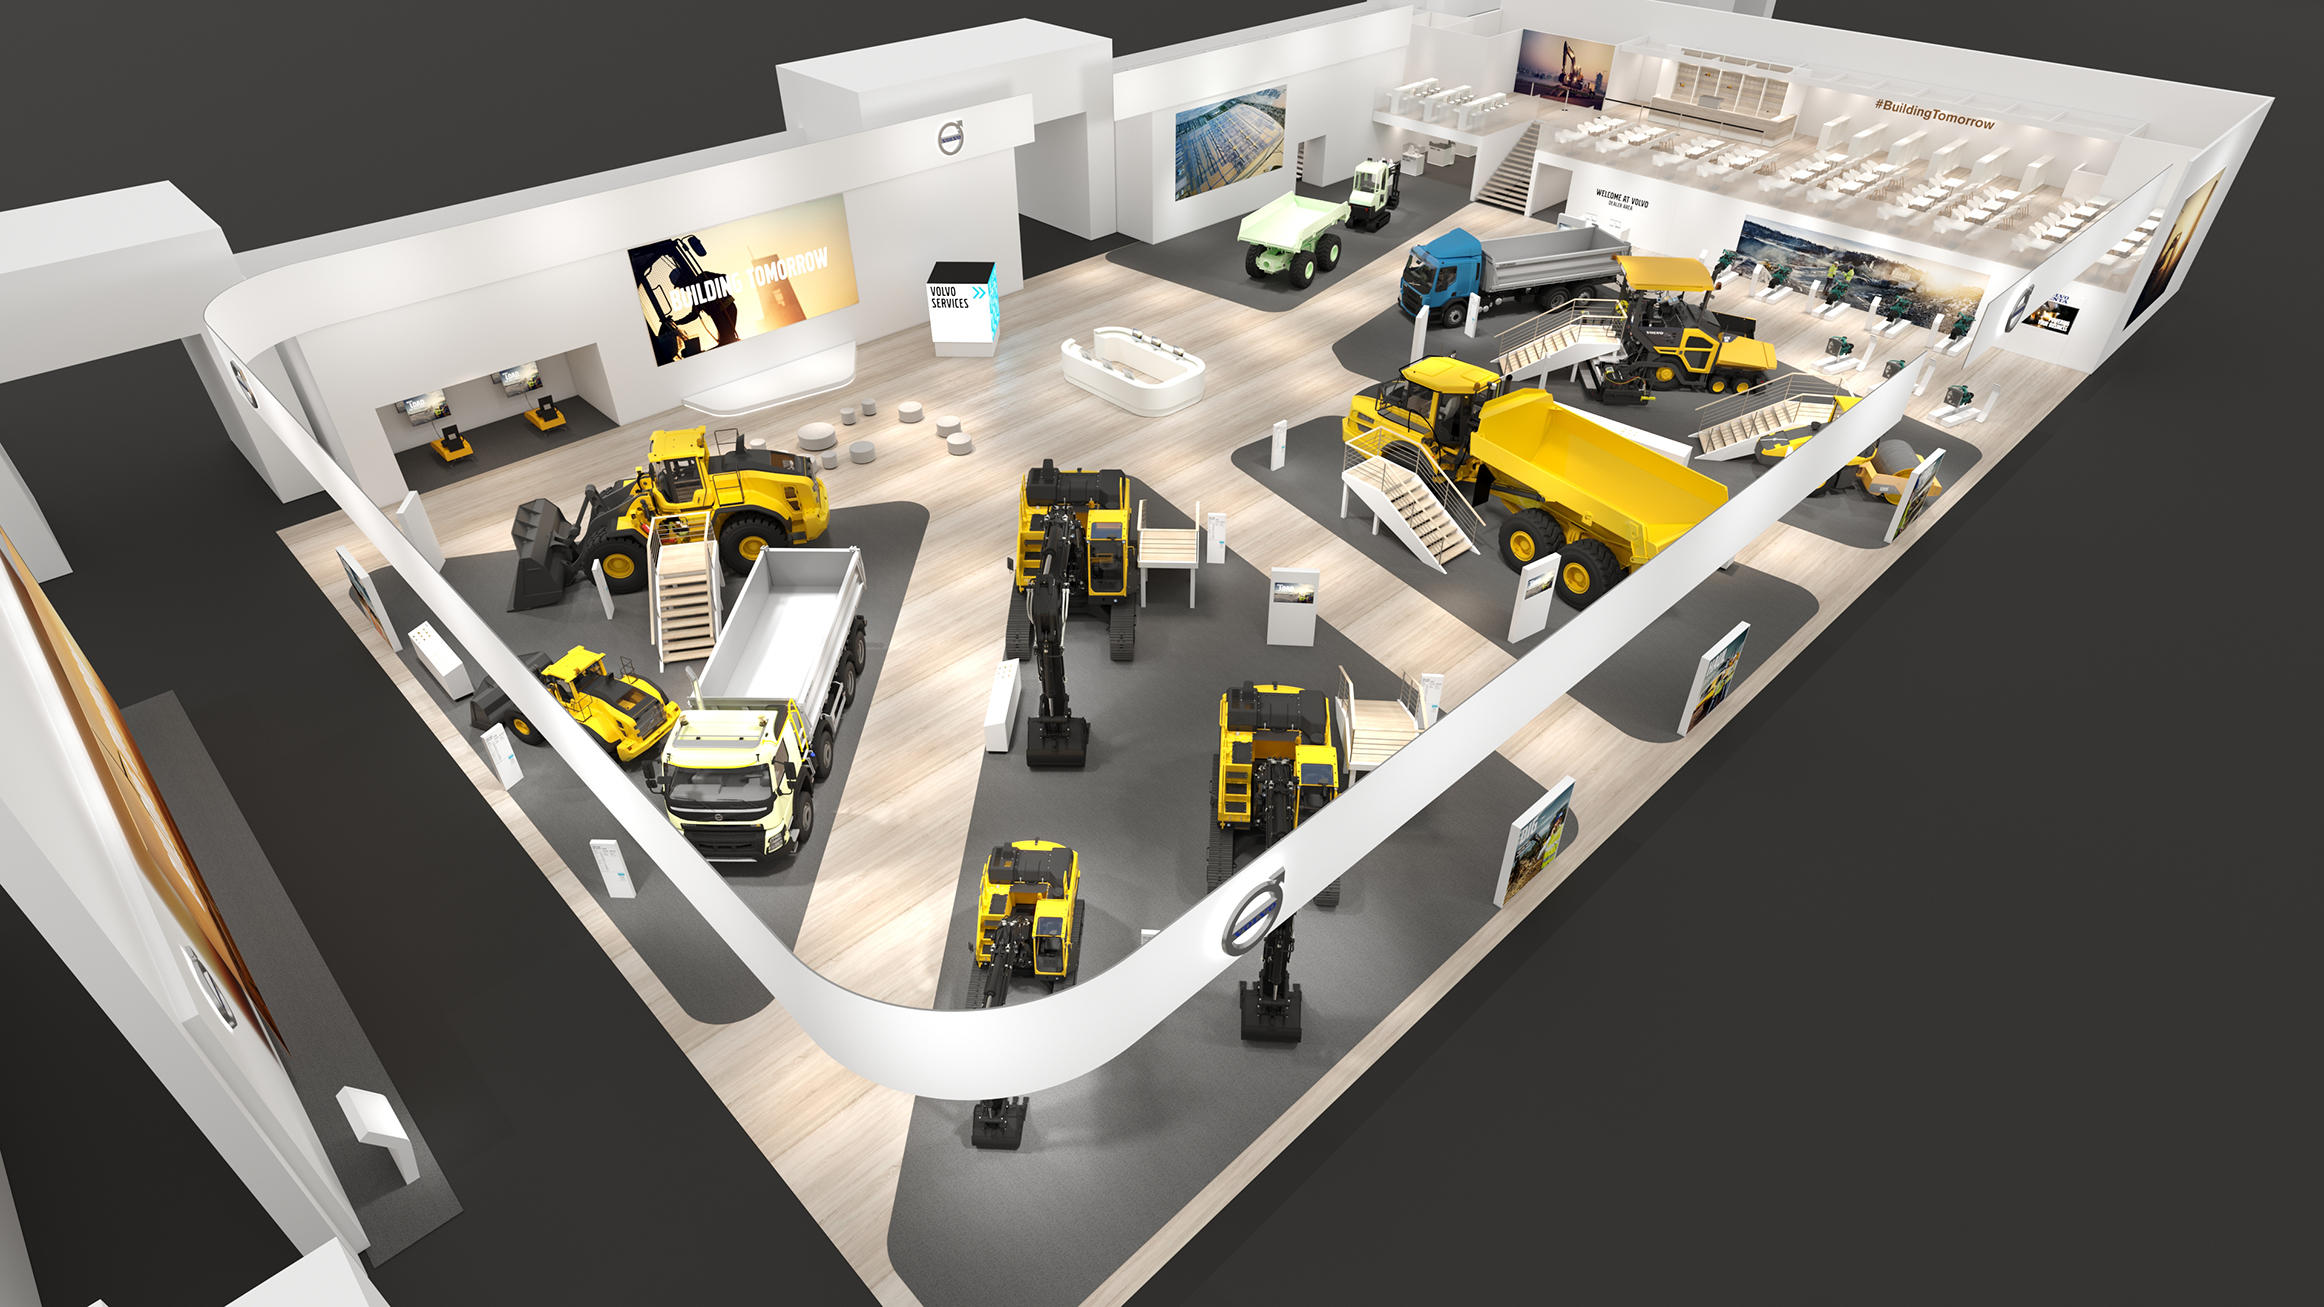 Volvo's indoor stand at bauma.